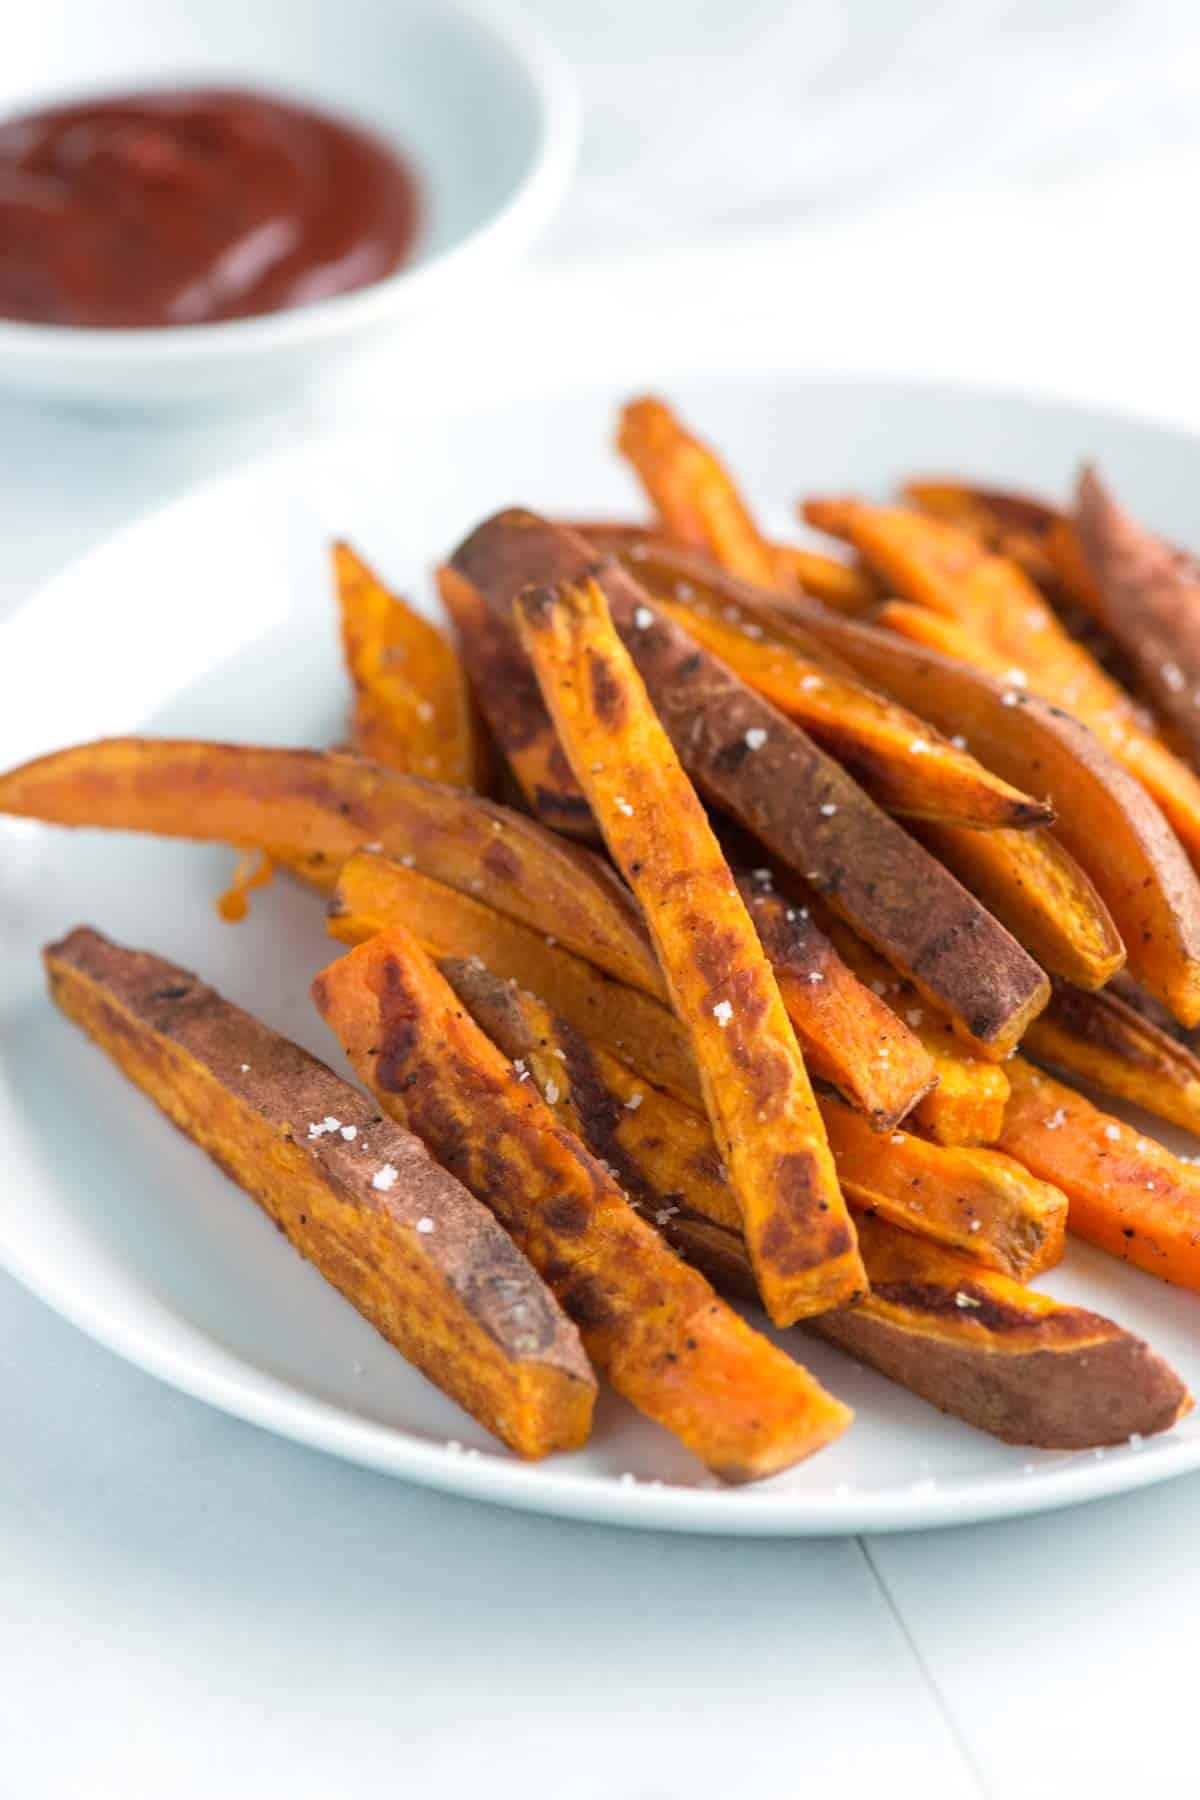 Sweet Potato Fries Recipes  Easy Homemade Baked Sweet Potato Fries Recipe